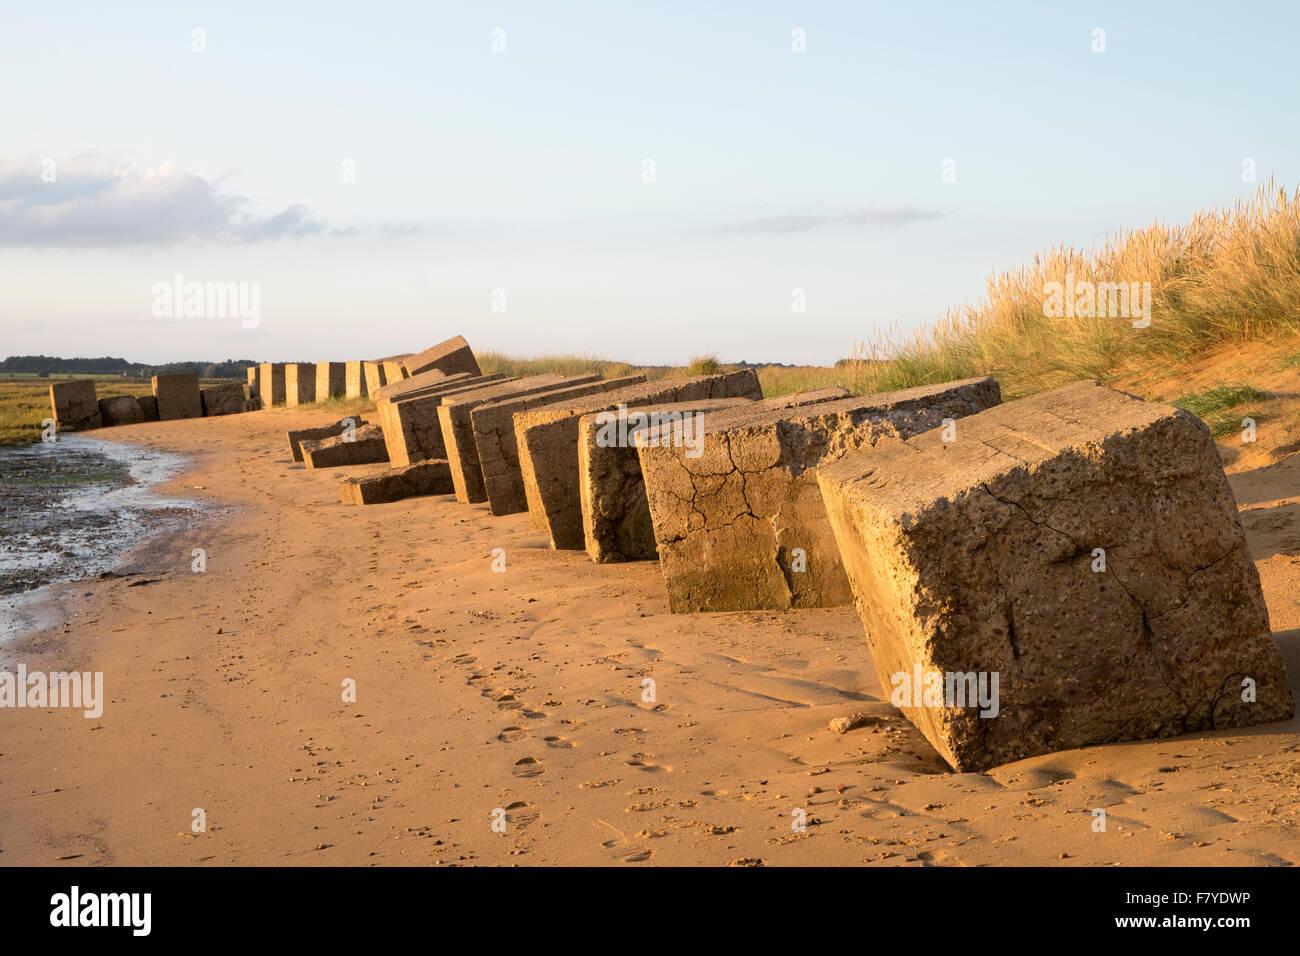 World War Two anti-invasion concrete blocks, river Deben, Bawdsey Ferry, Suffolk, UK. - Stock Image